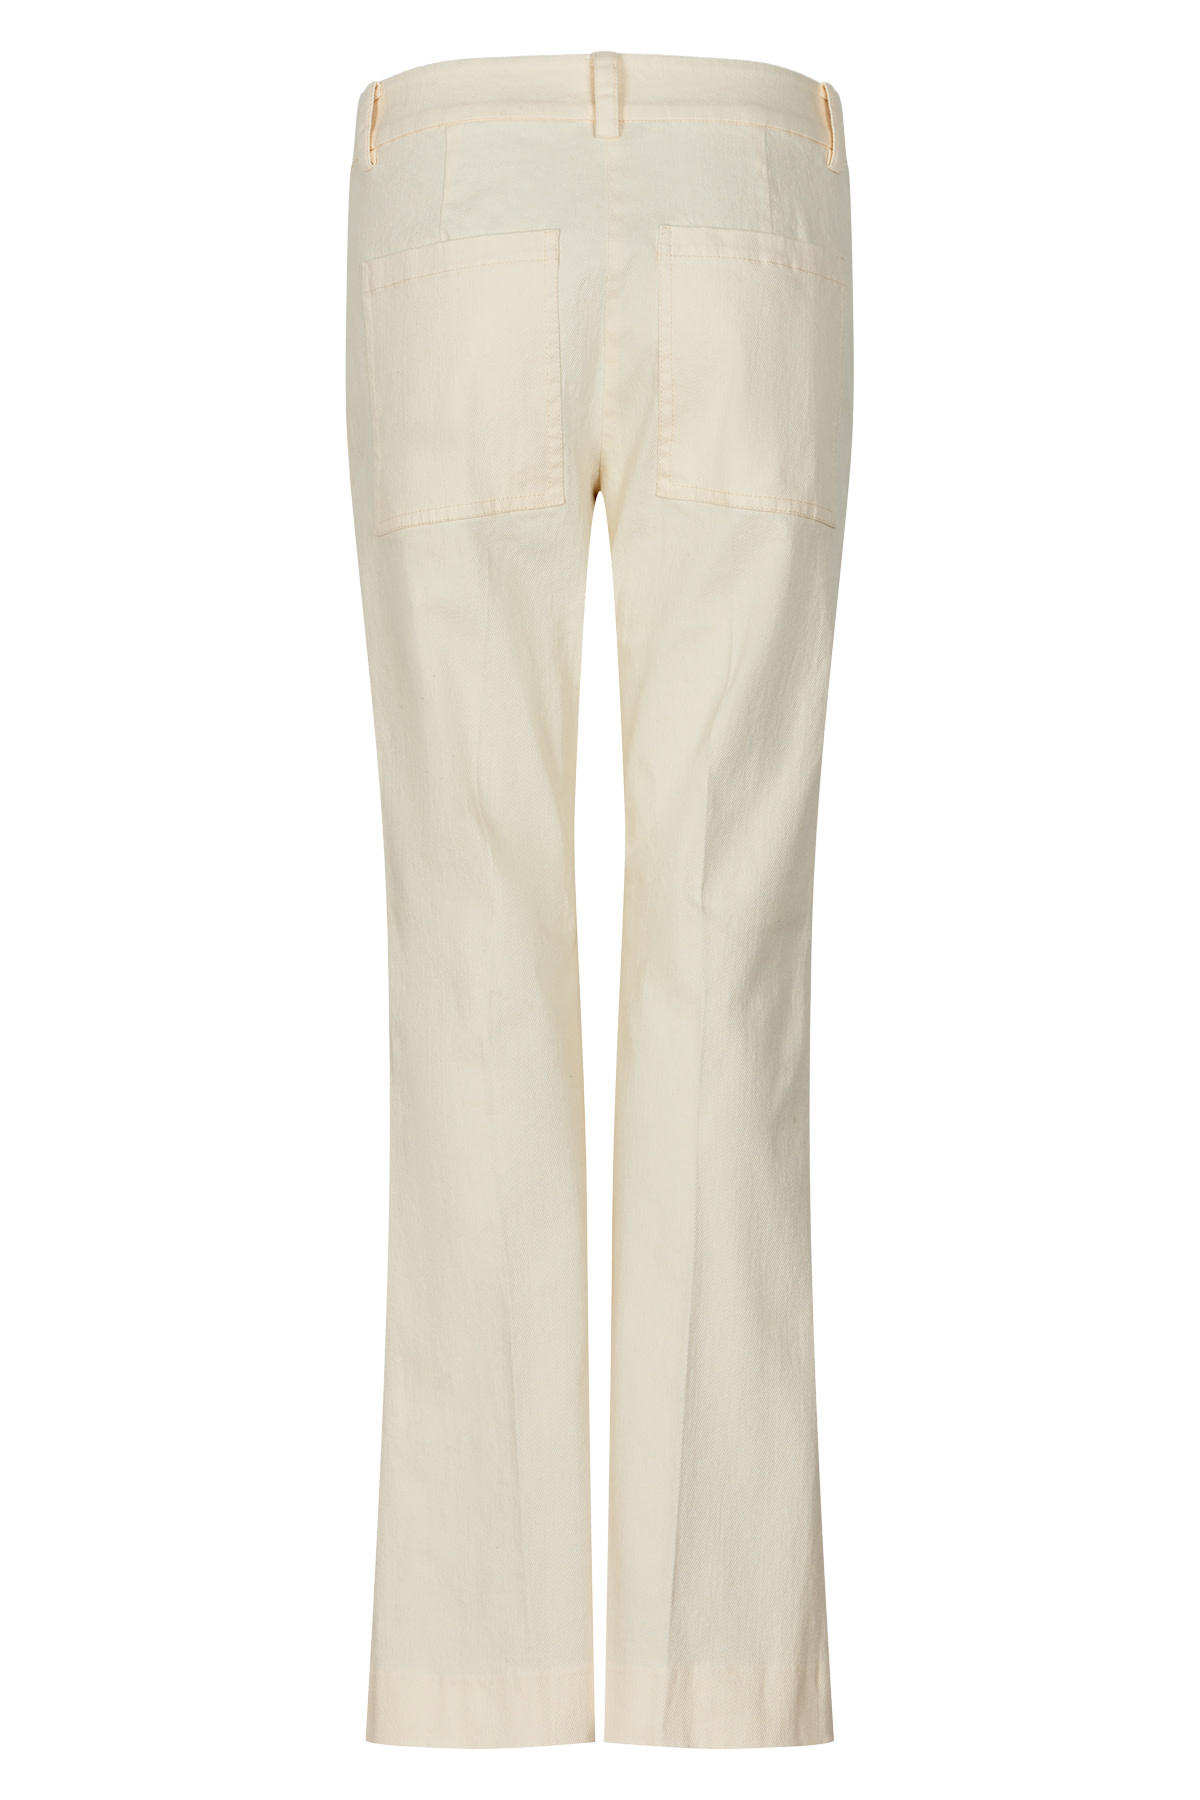 AndLess Stinea Pants